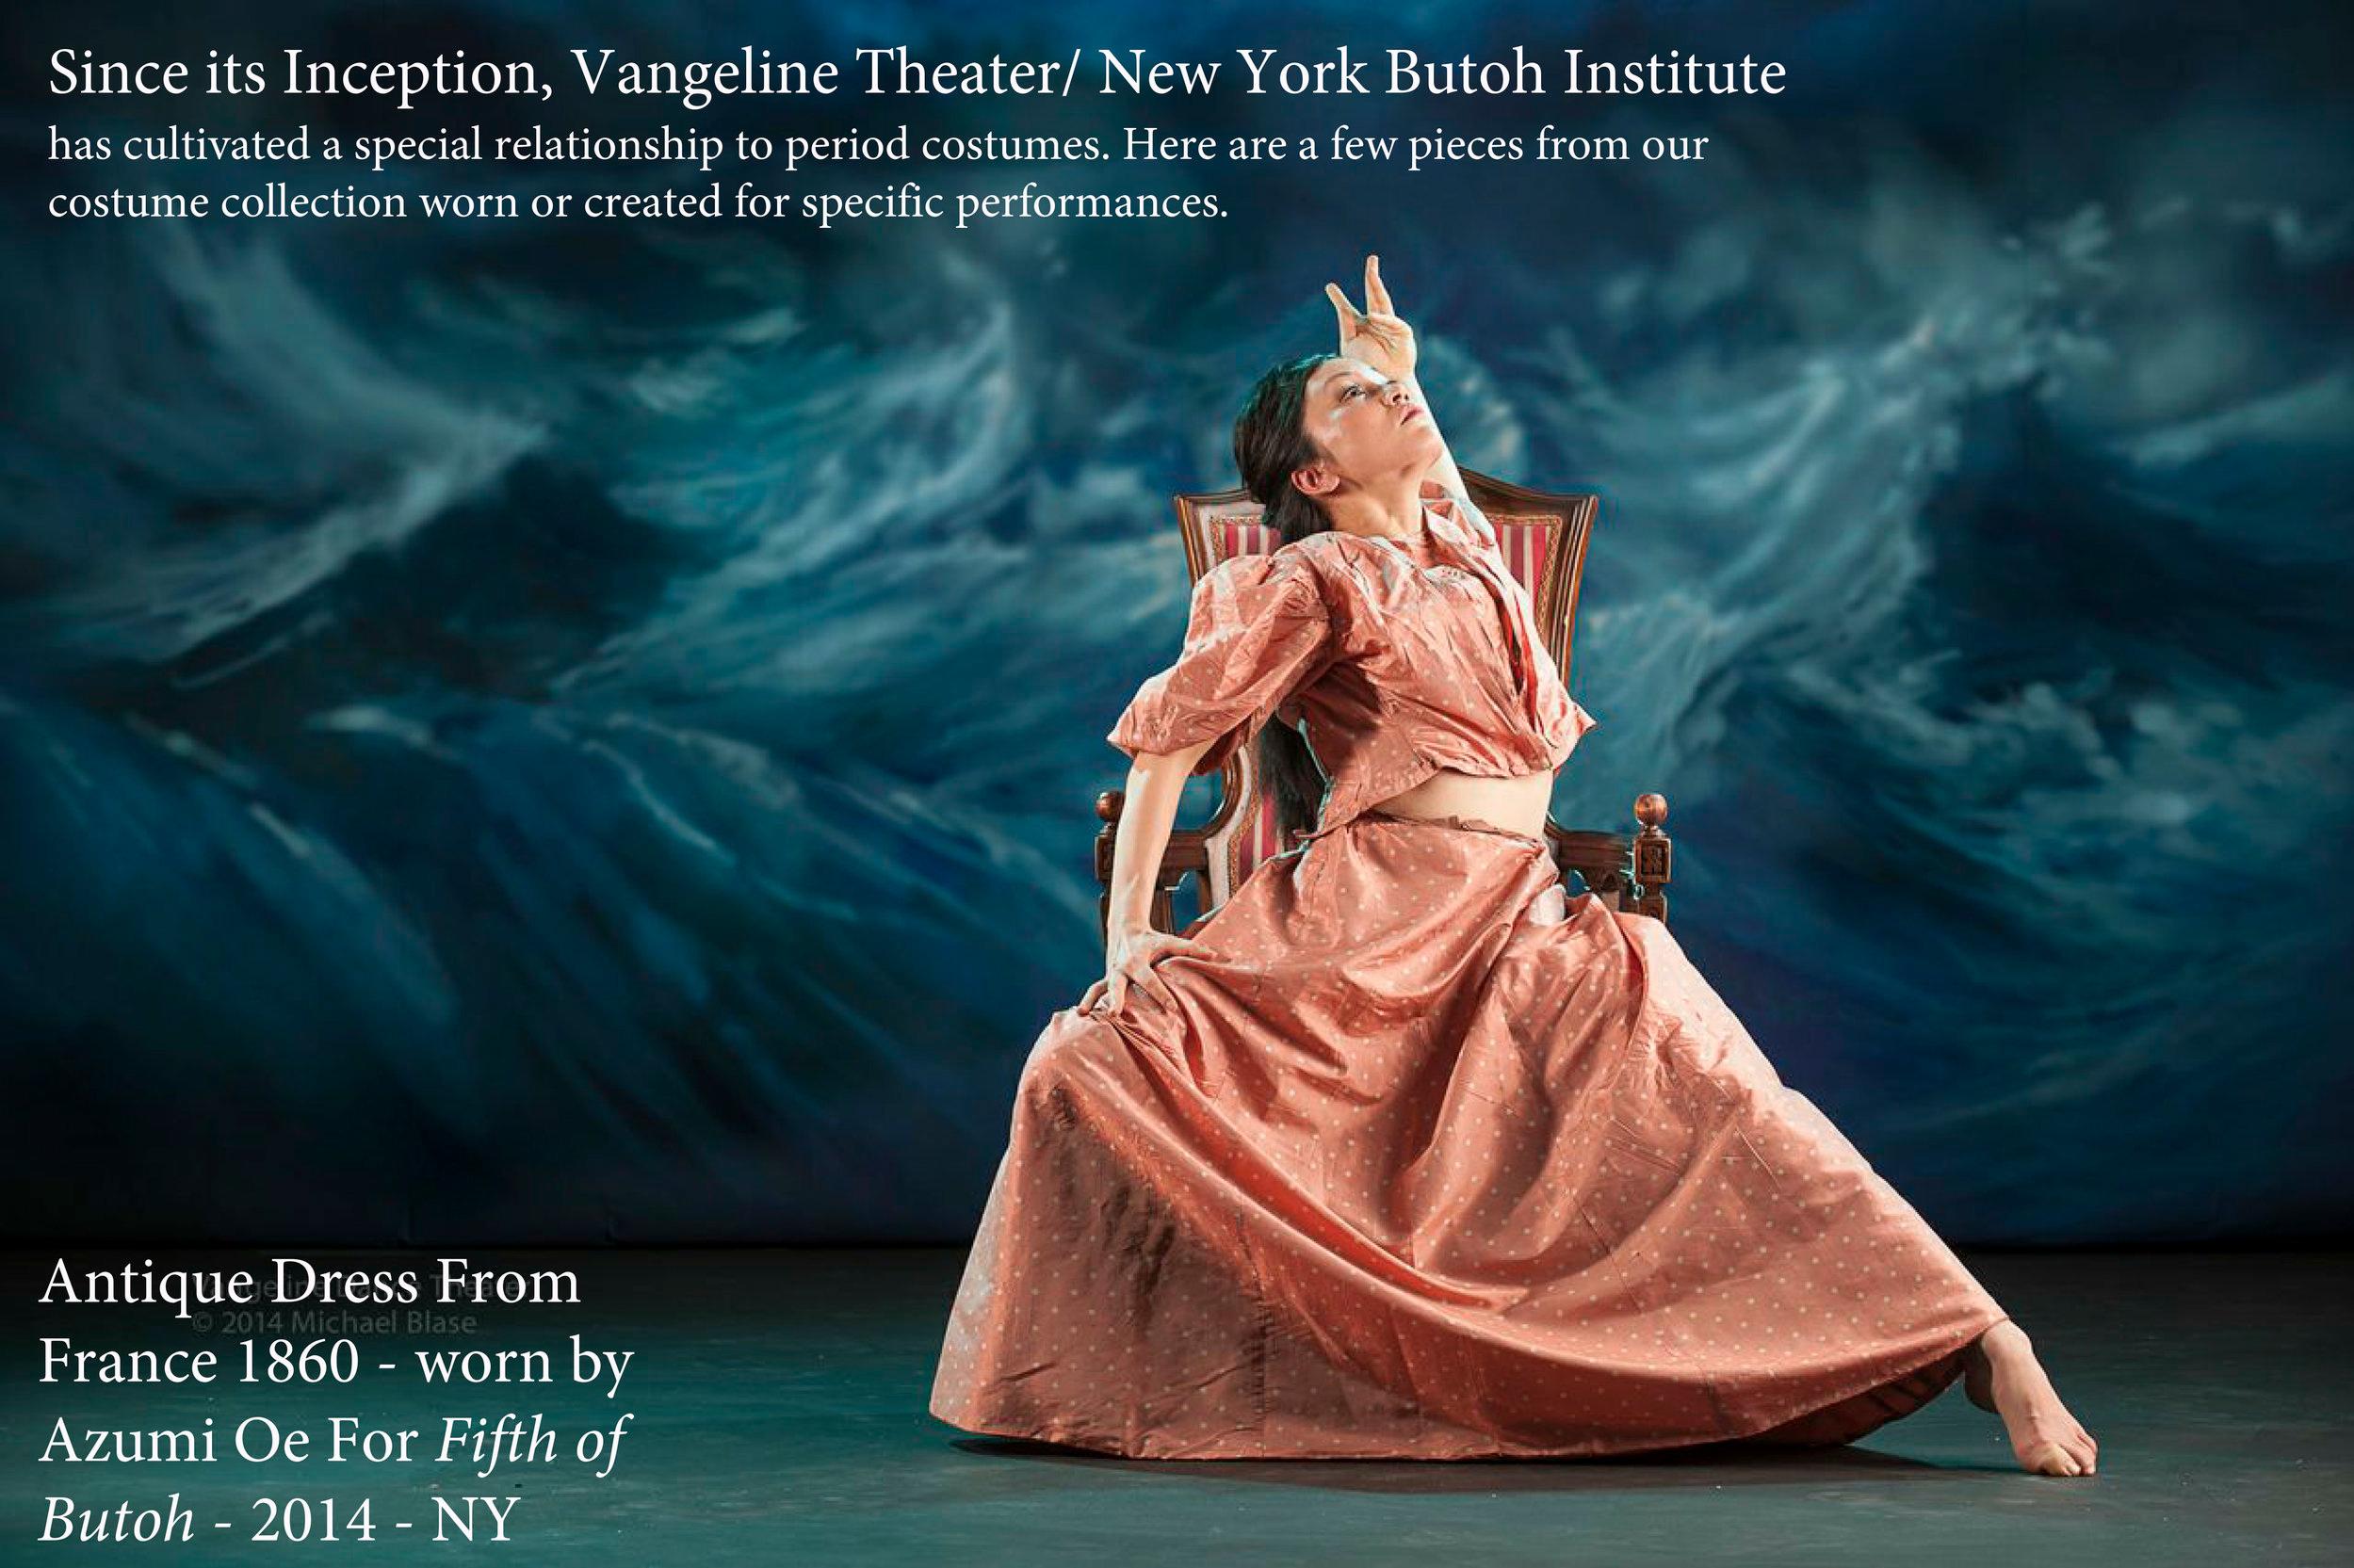 1-Vangeline Theater Costume Collection-1.jpg